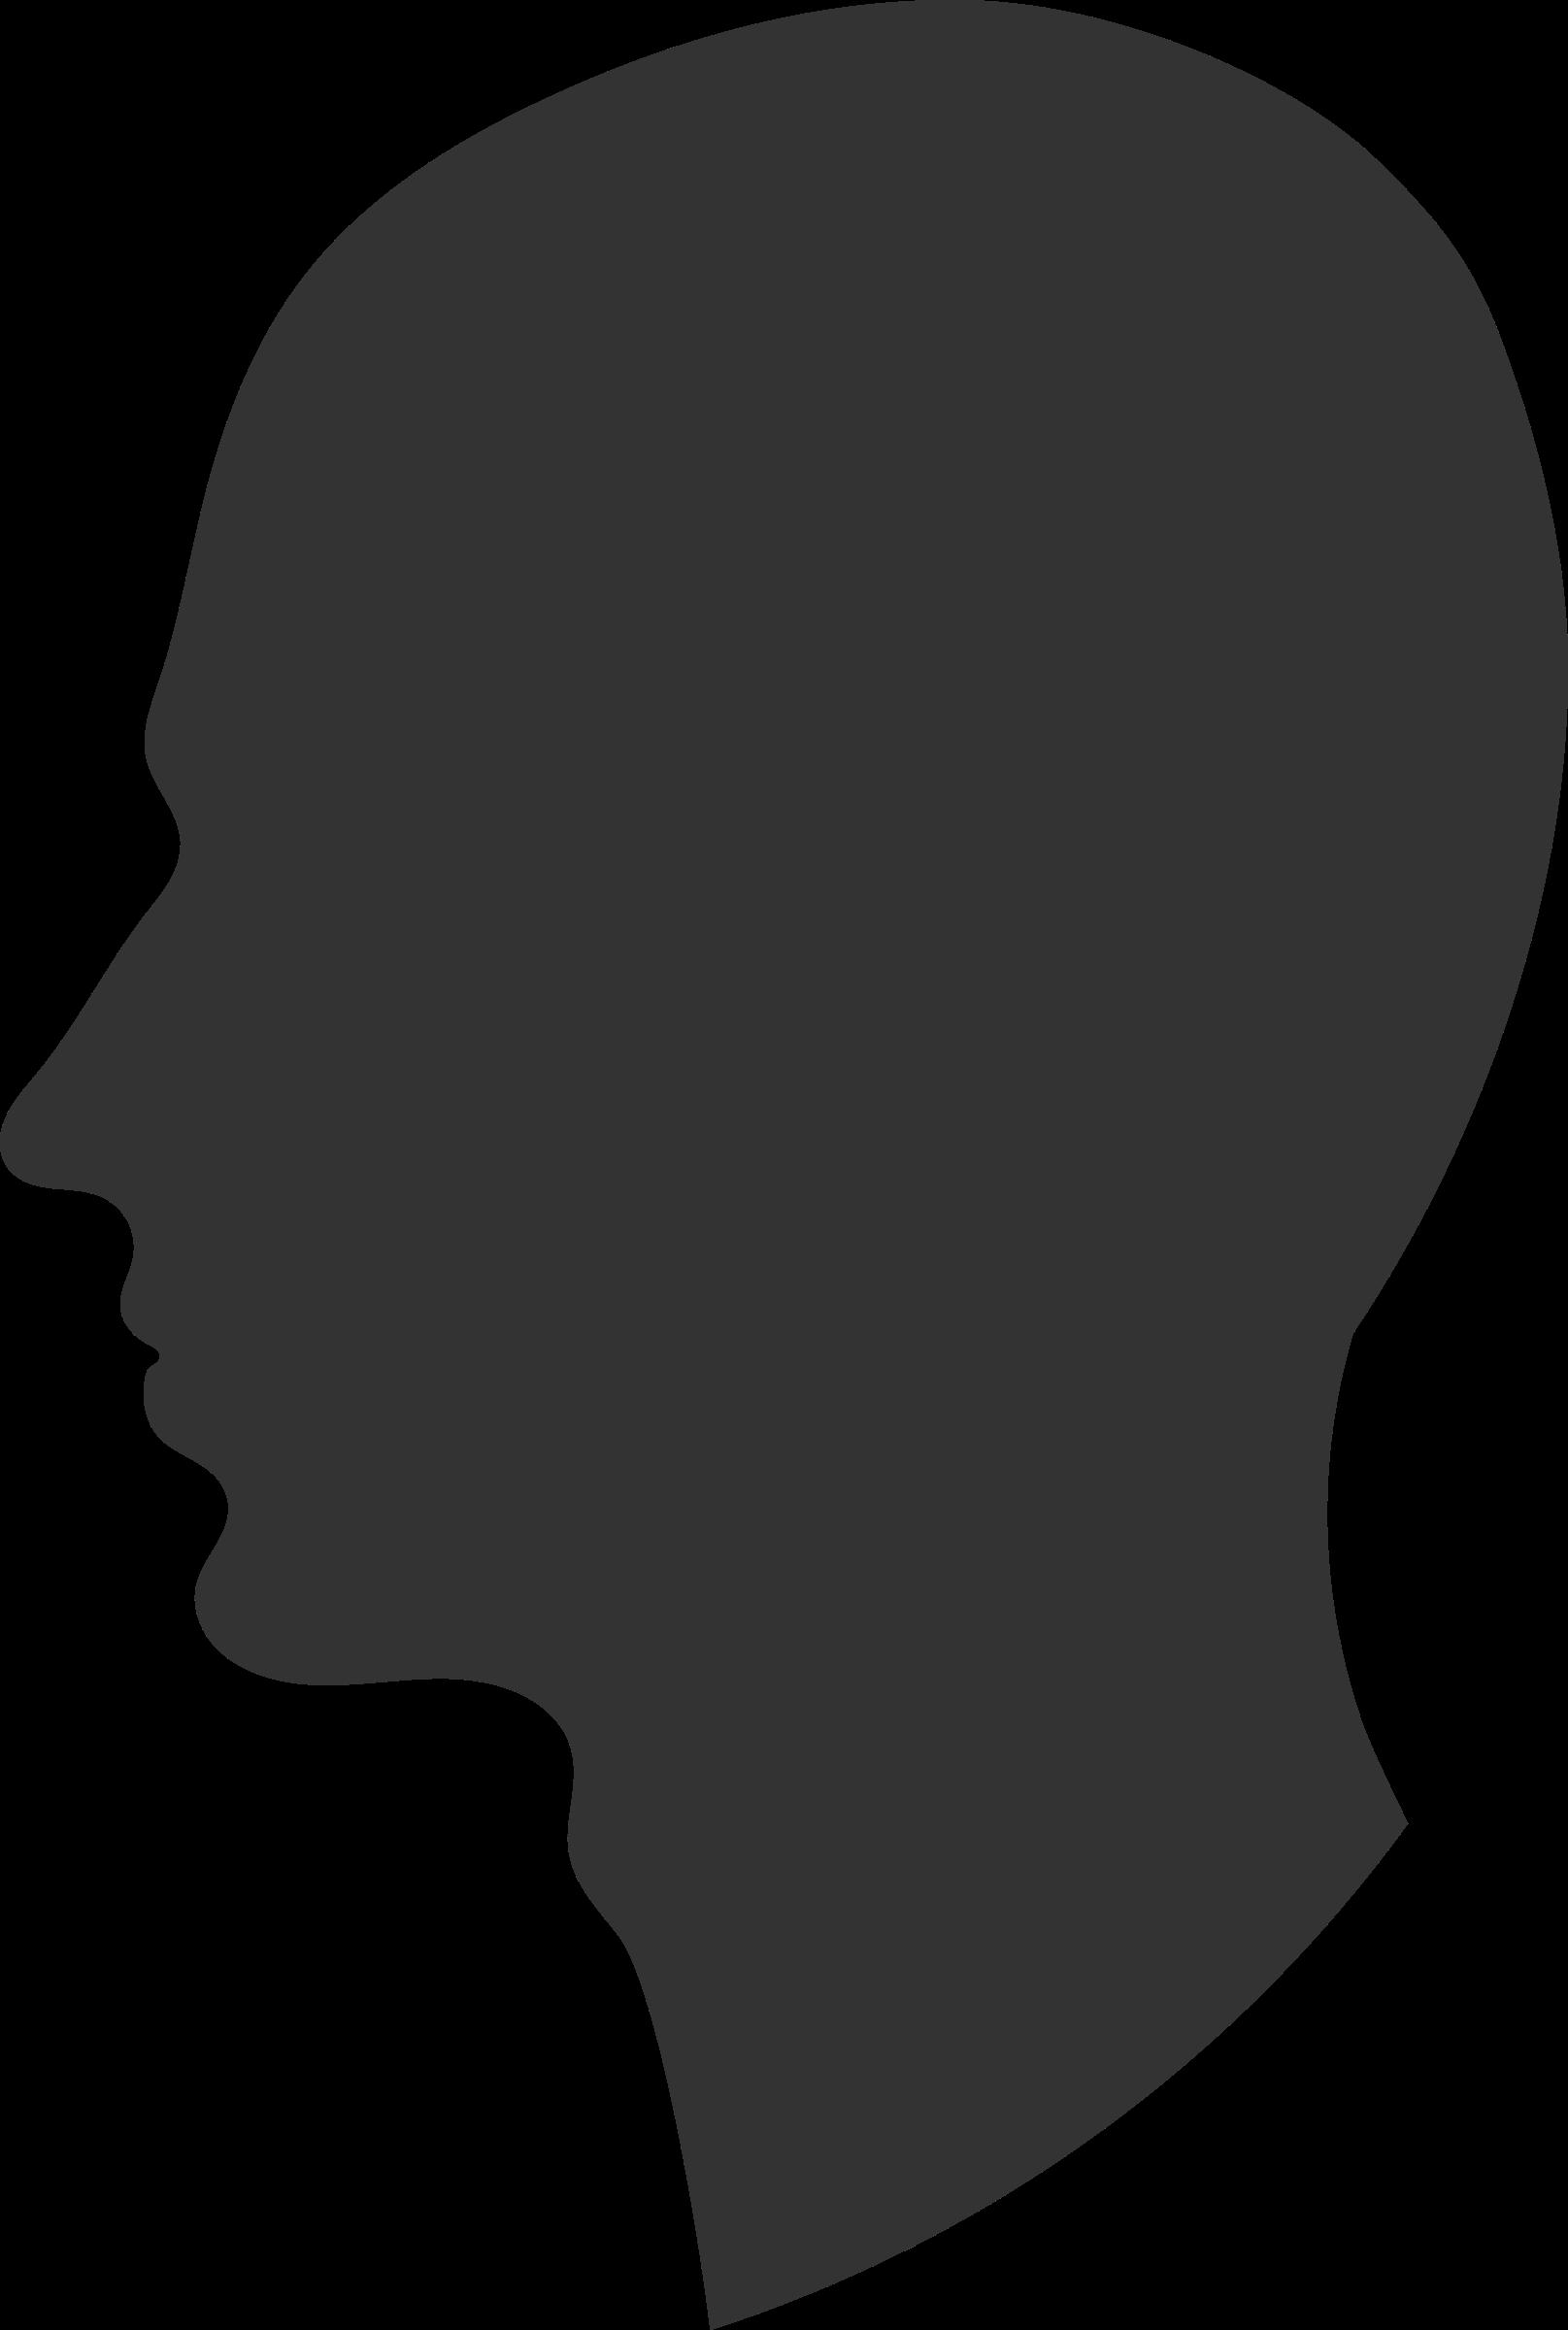 BIG IMAGE (PNG) - PNG Head